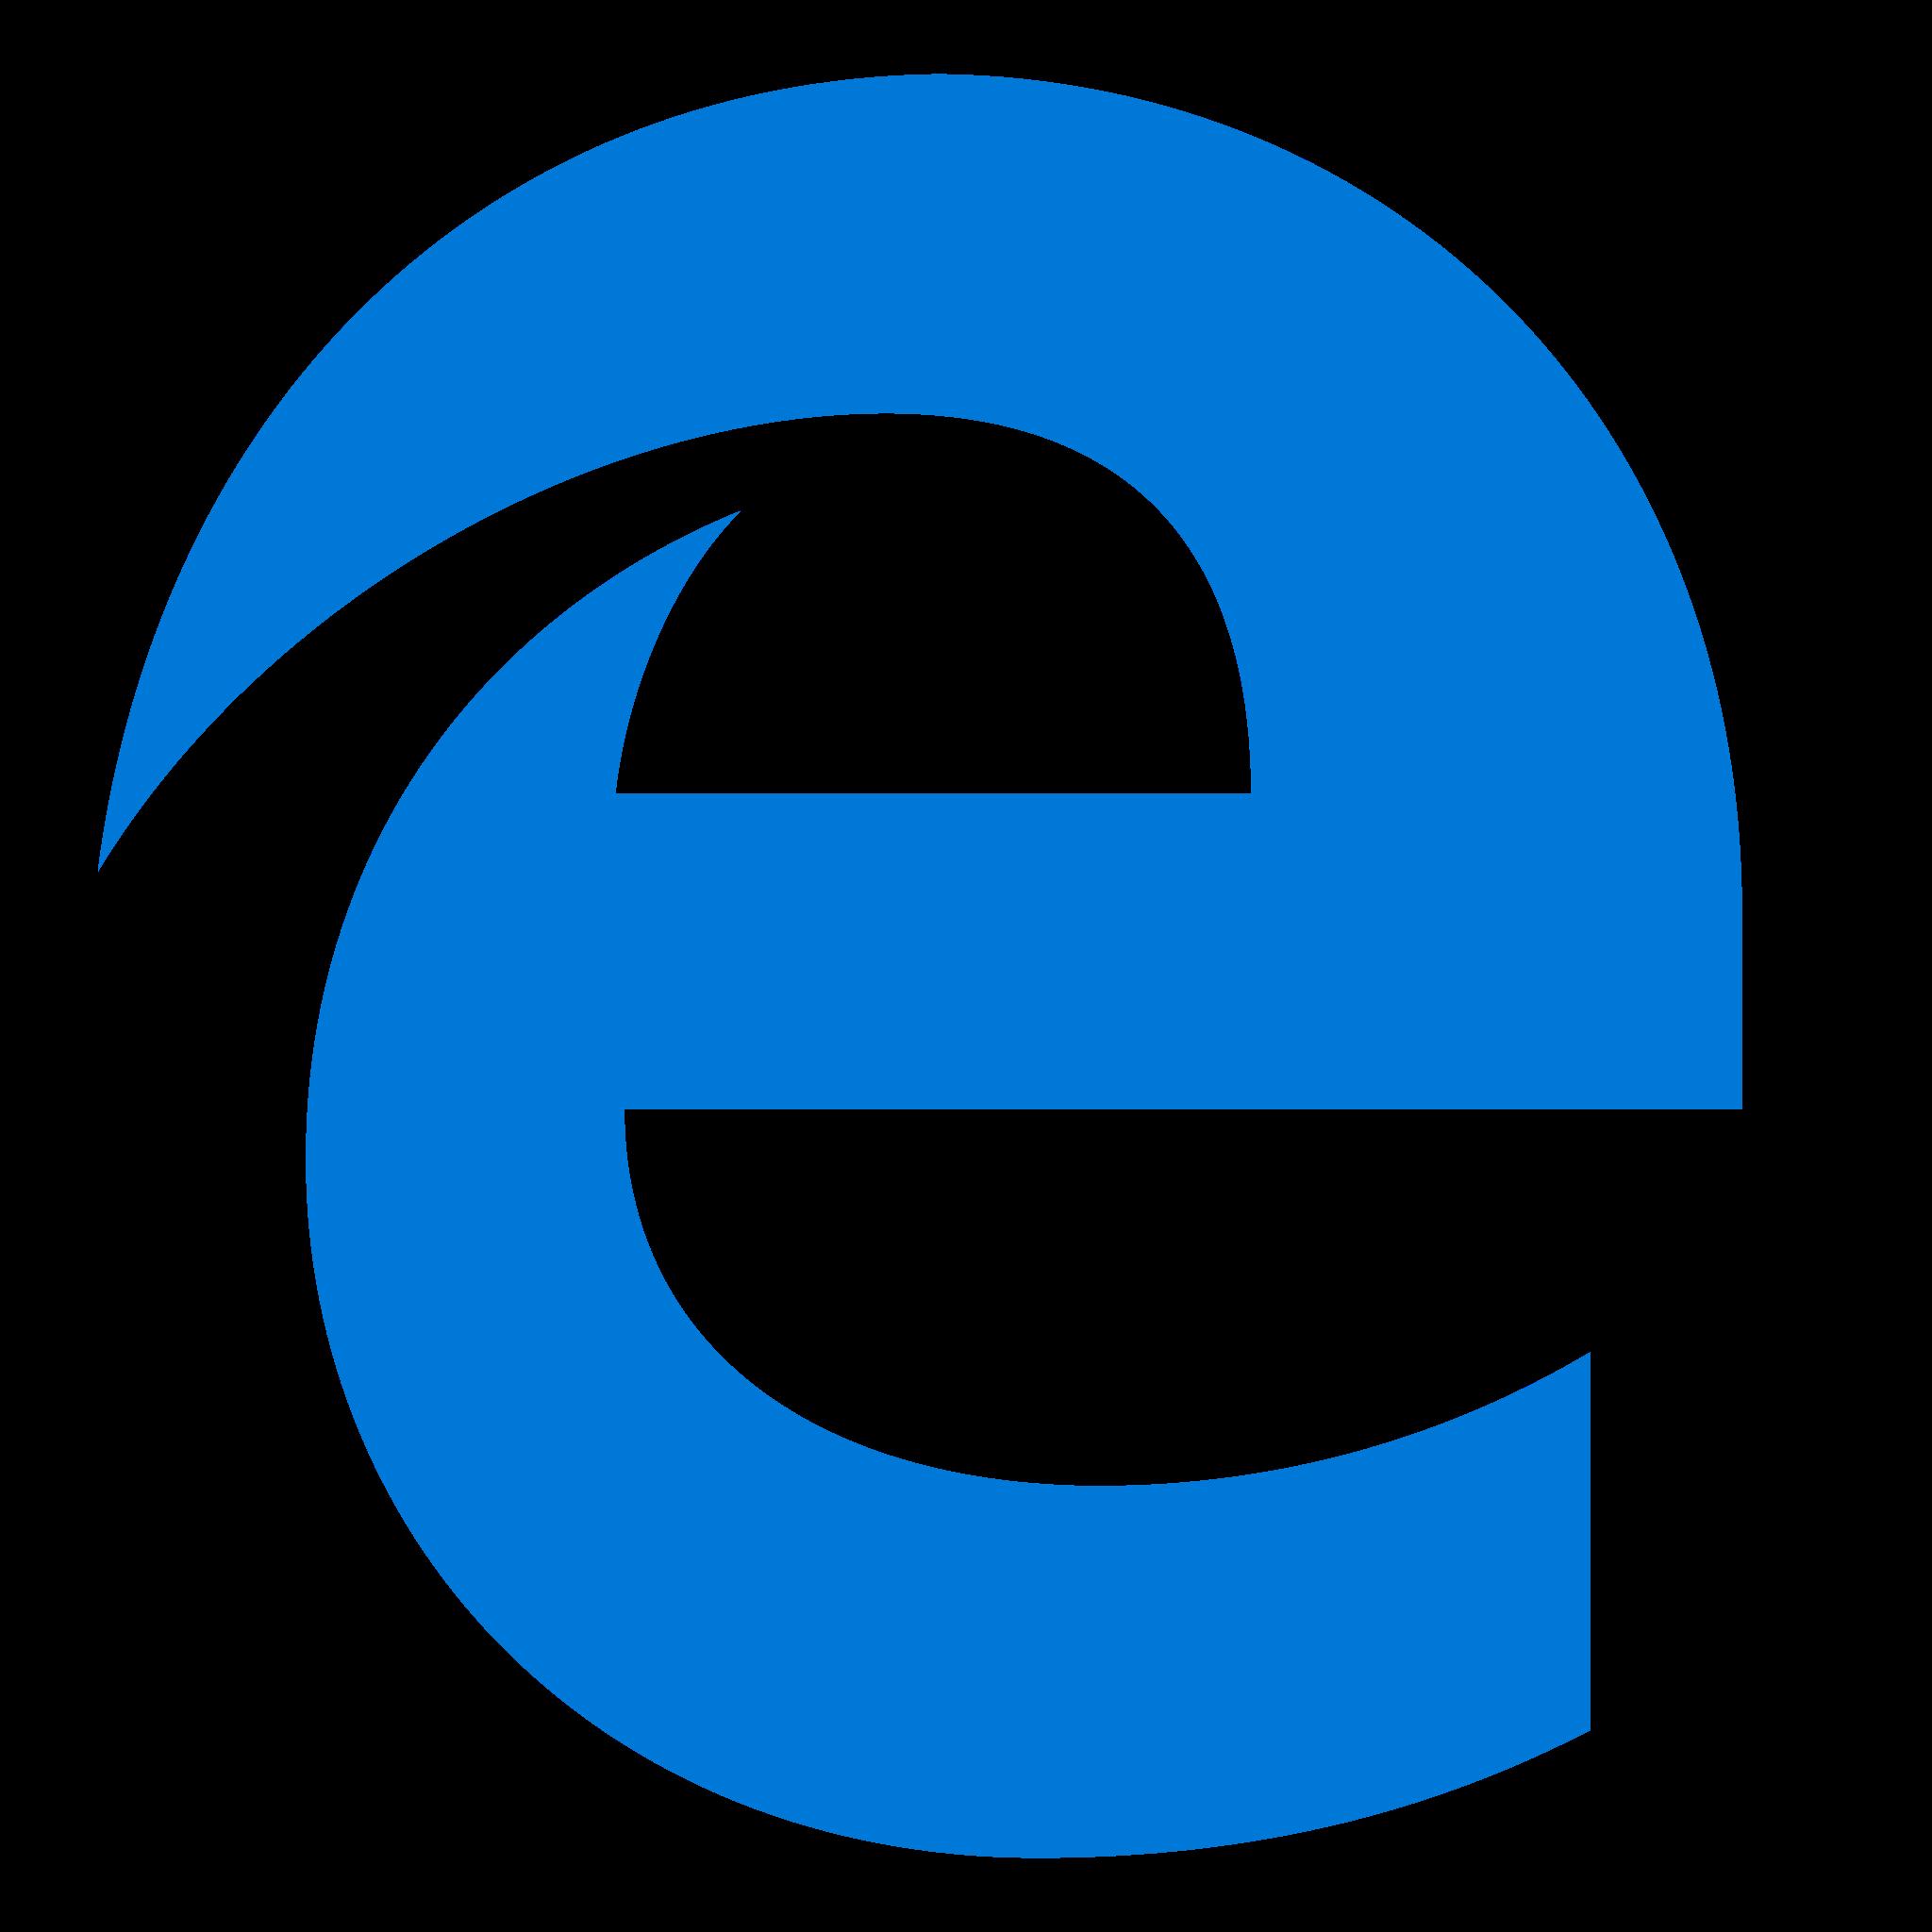 IE / Edge